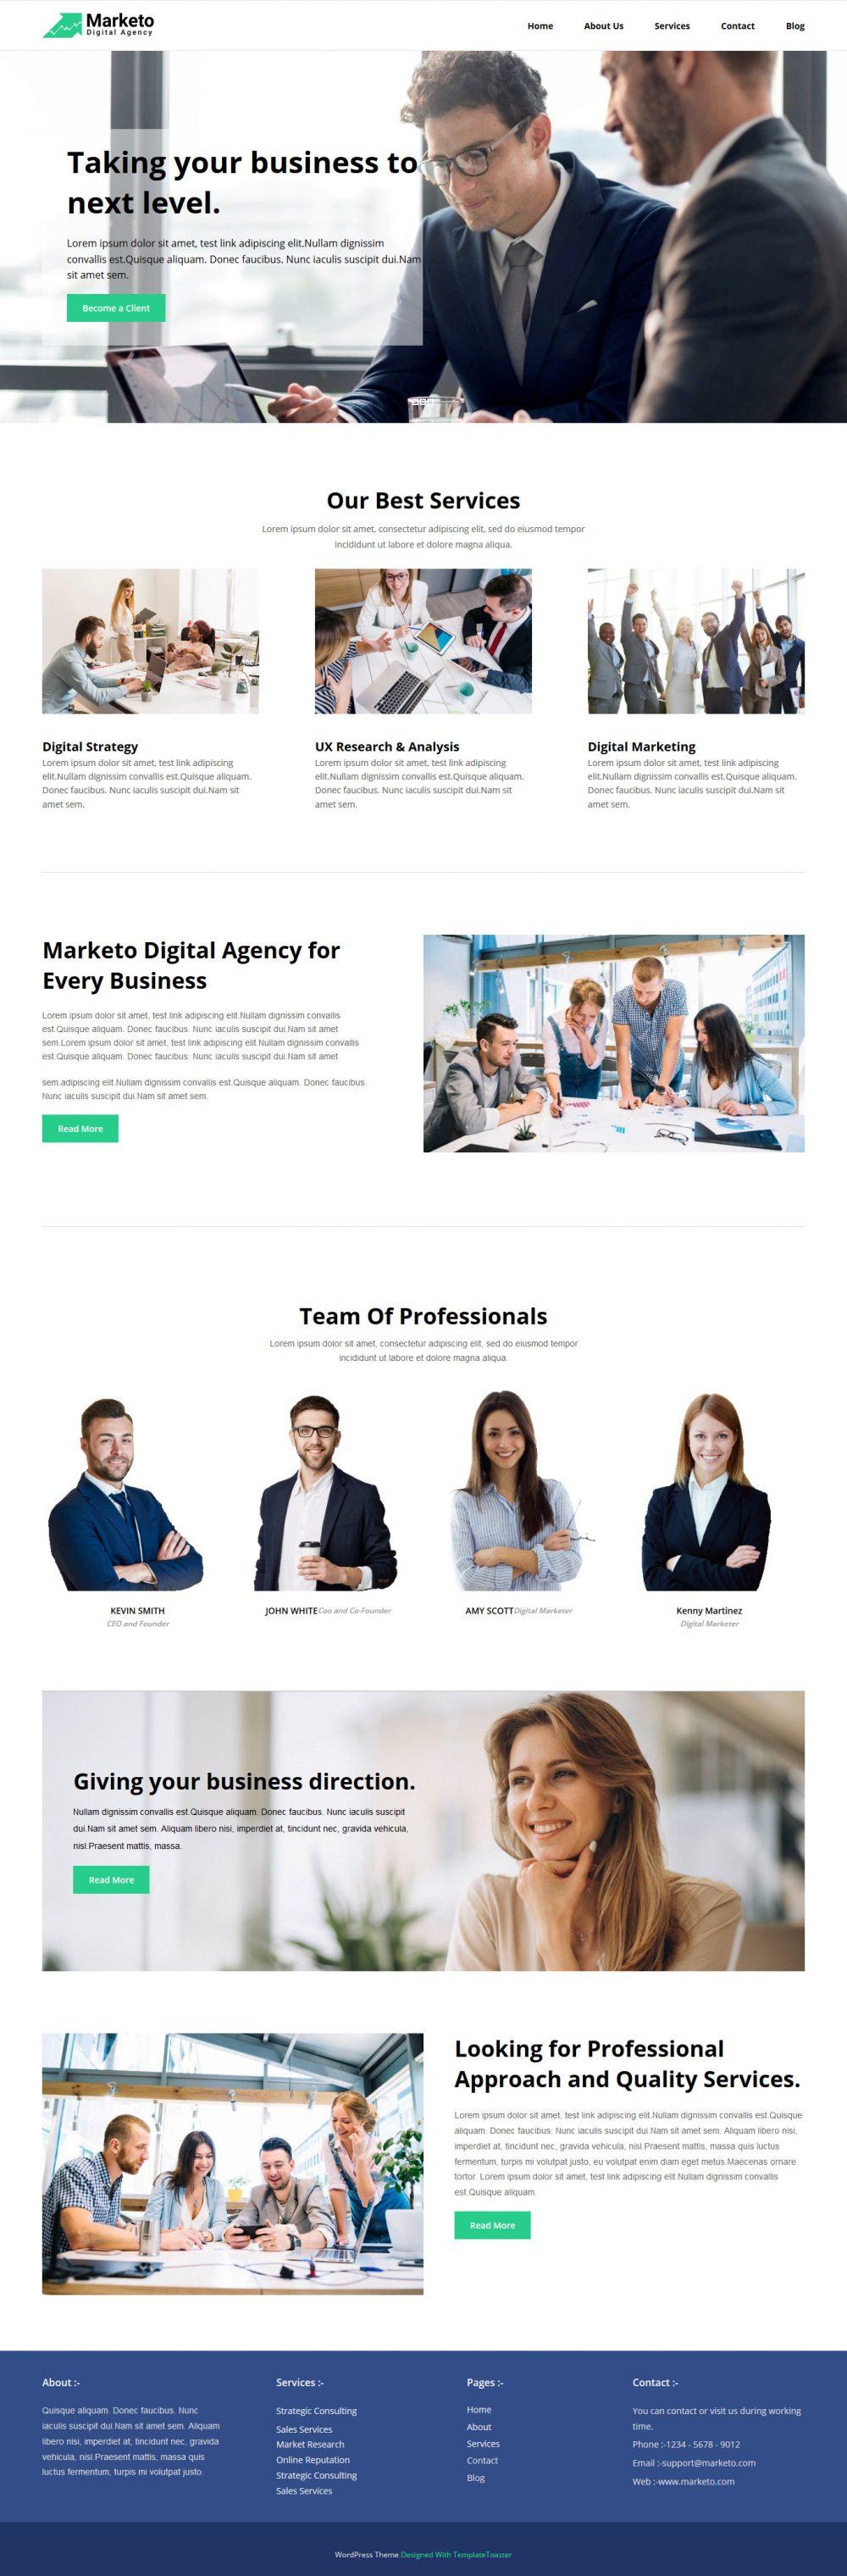 Marketo Marketing Consultancy Services Drupal Theme